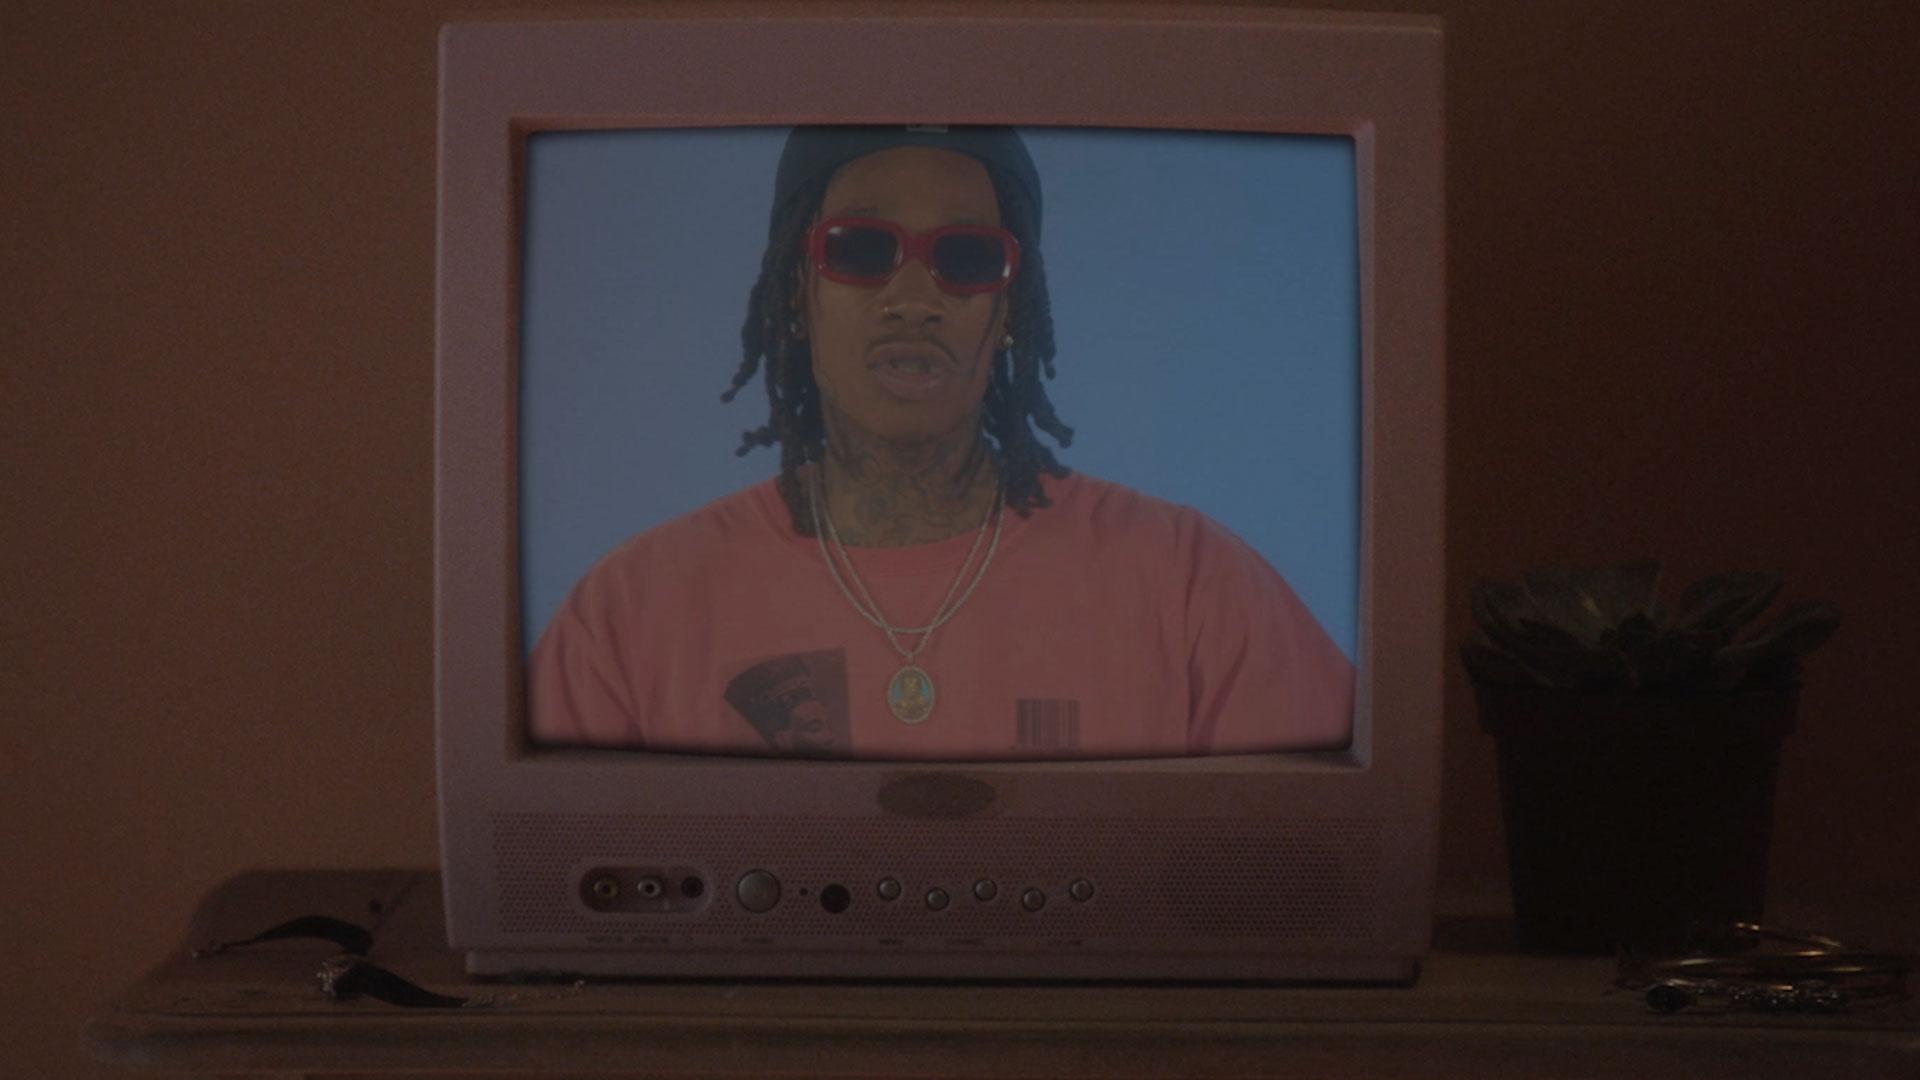 Wiz Khalifa is on an old monitor screen facing the camera under moody orange tones